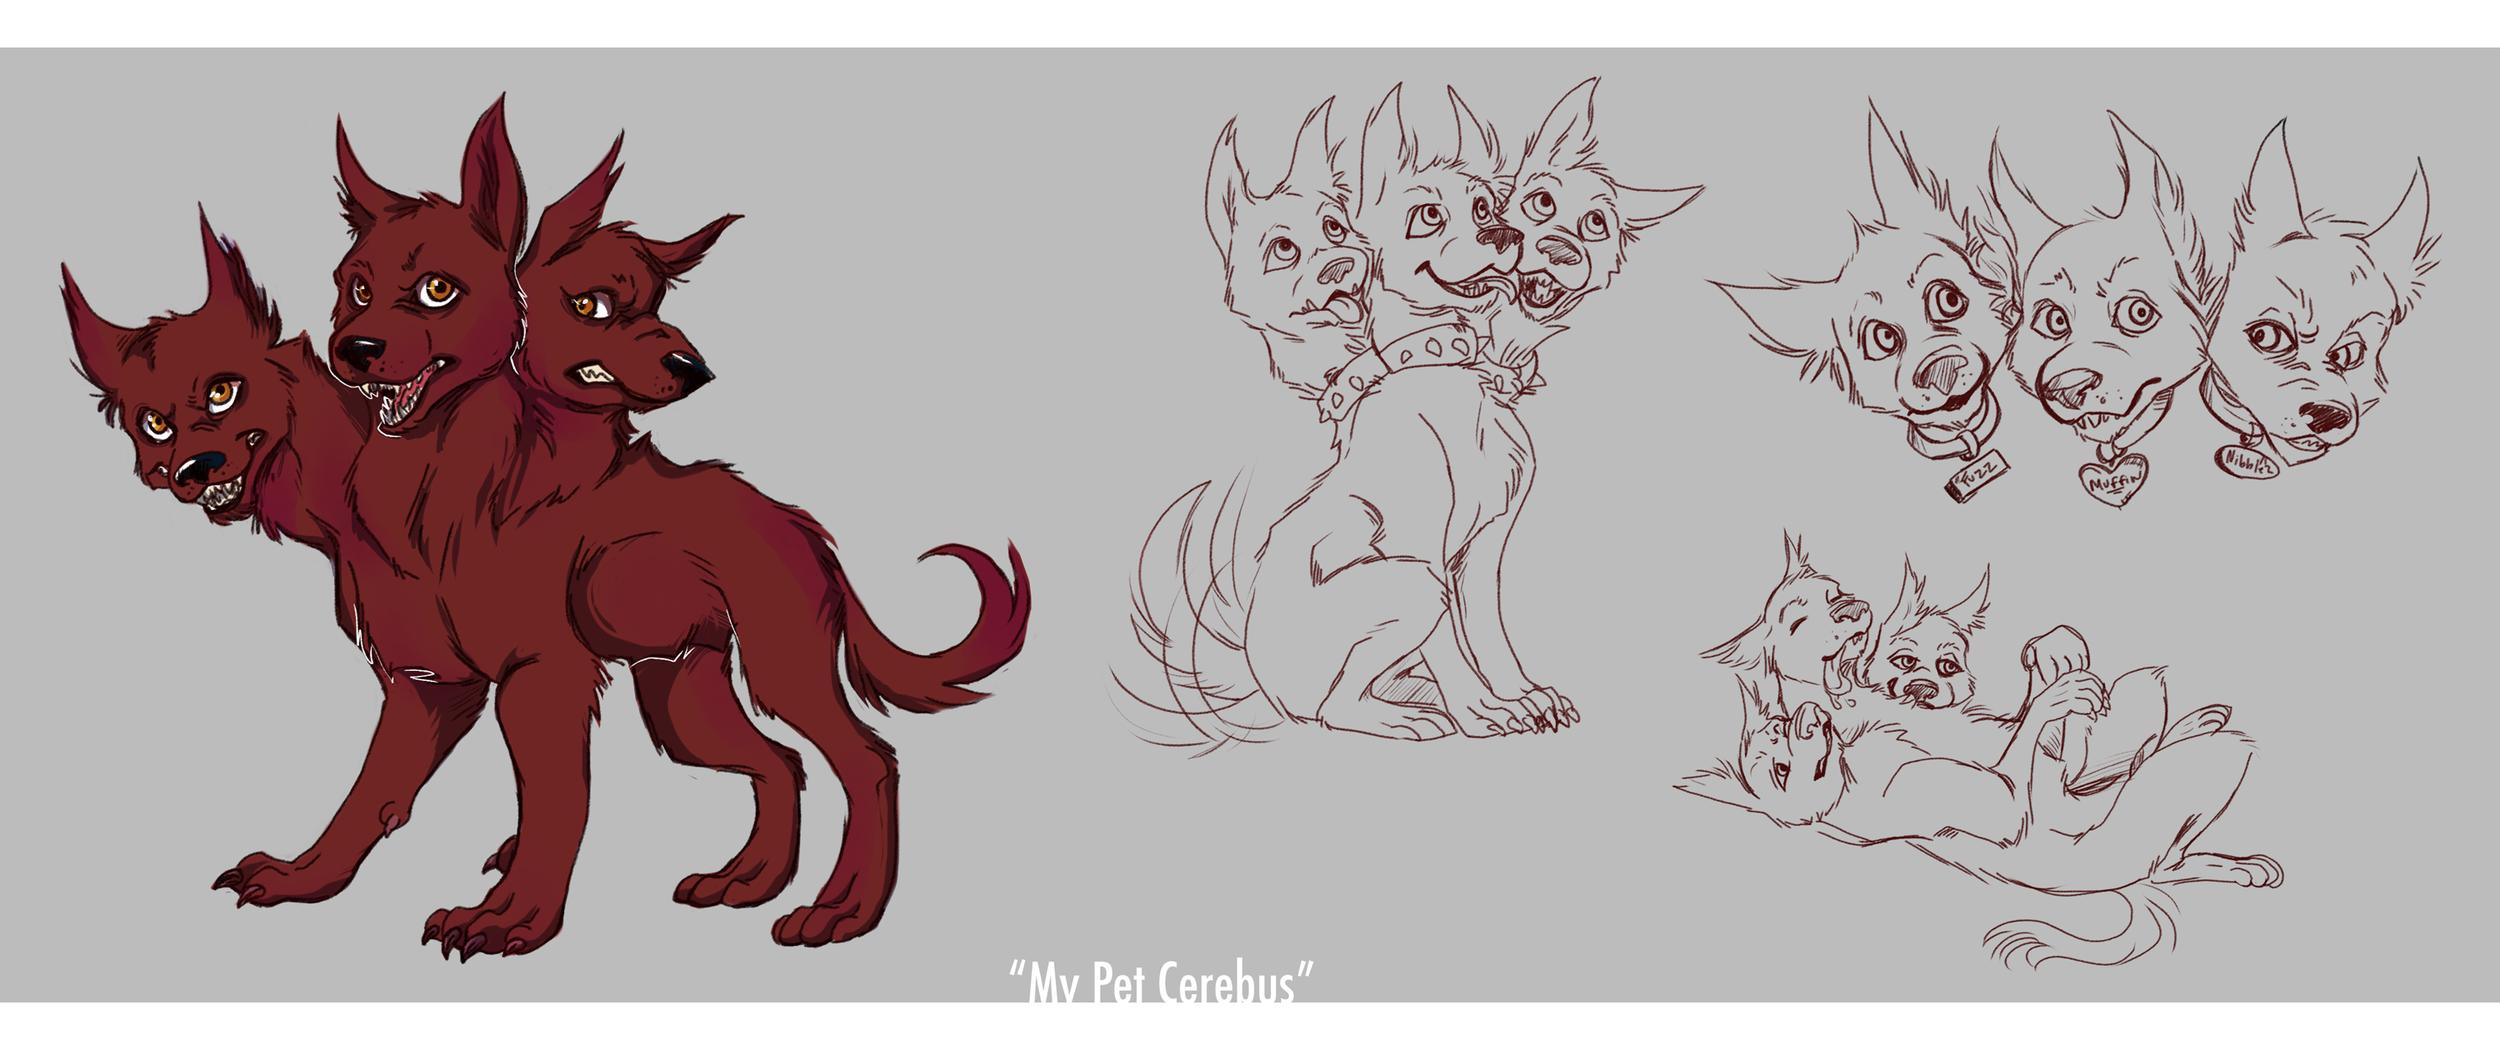 """My Pet Cerebus"" Concepts"